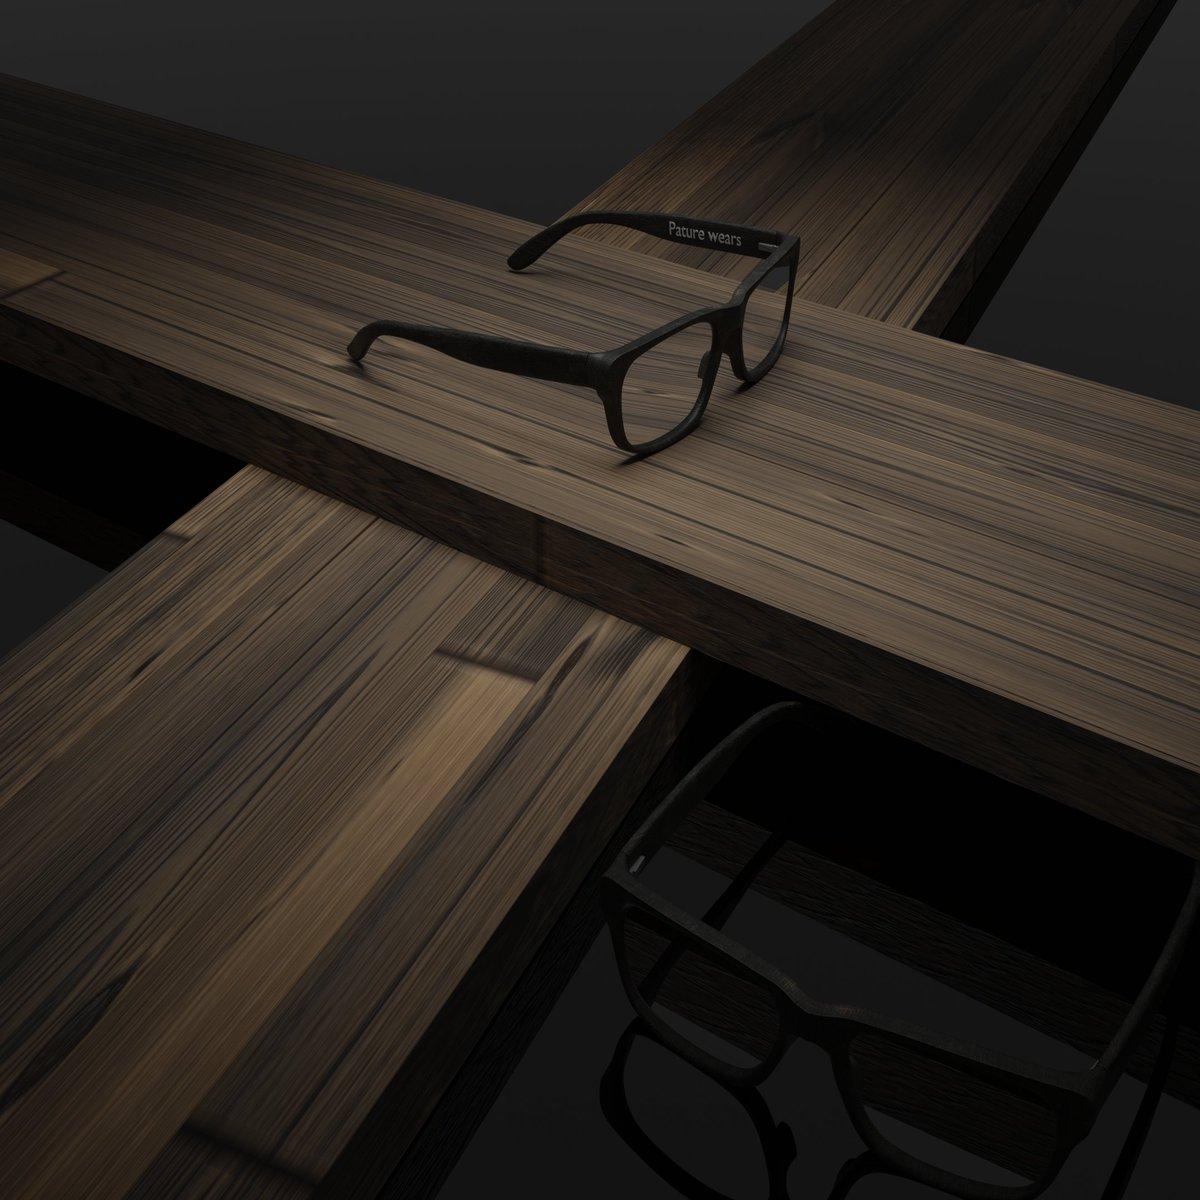 Another spectacles product design for my portfolio. Rendered in cycles. 2k. #b3d #designer #conceptart #design #branding #blender #Blender3d #ArtistOnTwitter open for commissions; adenijiadeleye003@gnail.com  Please kindly help retweet.